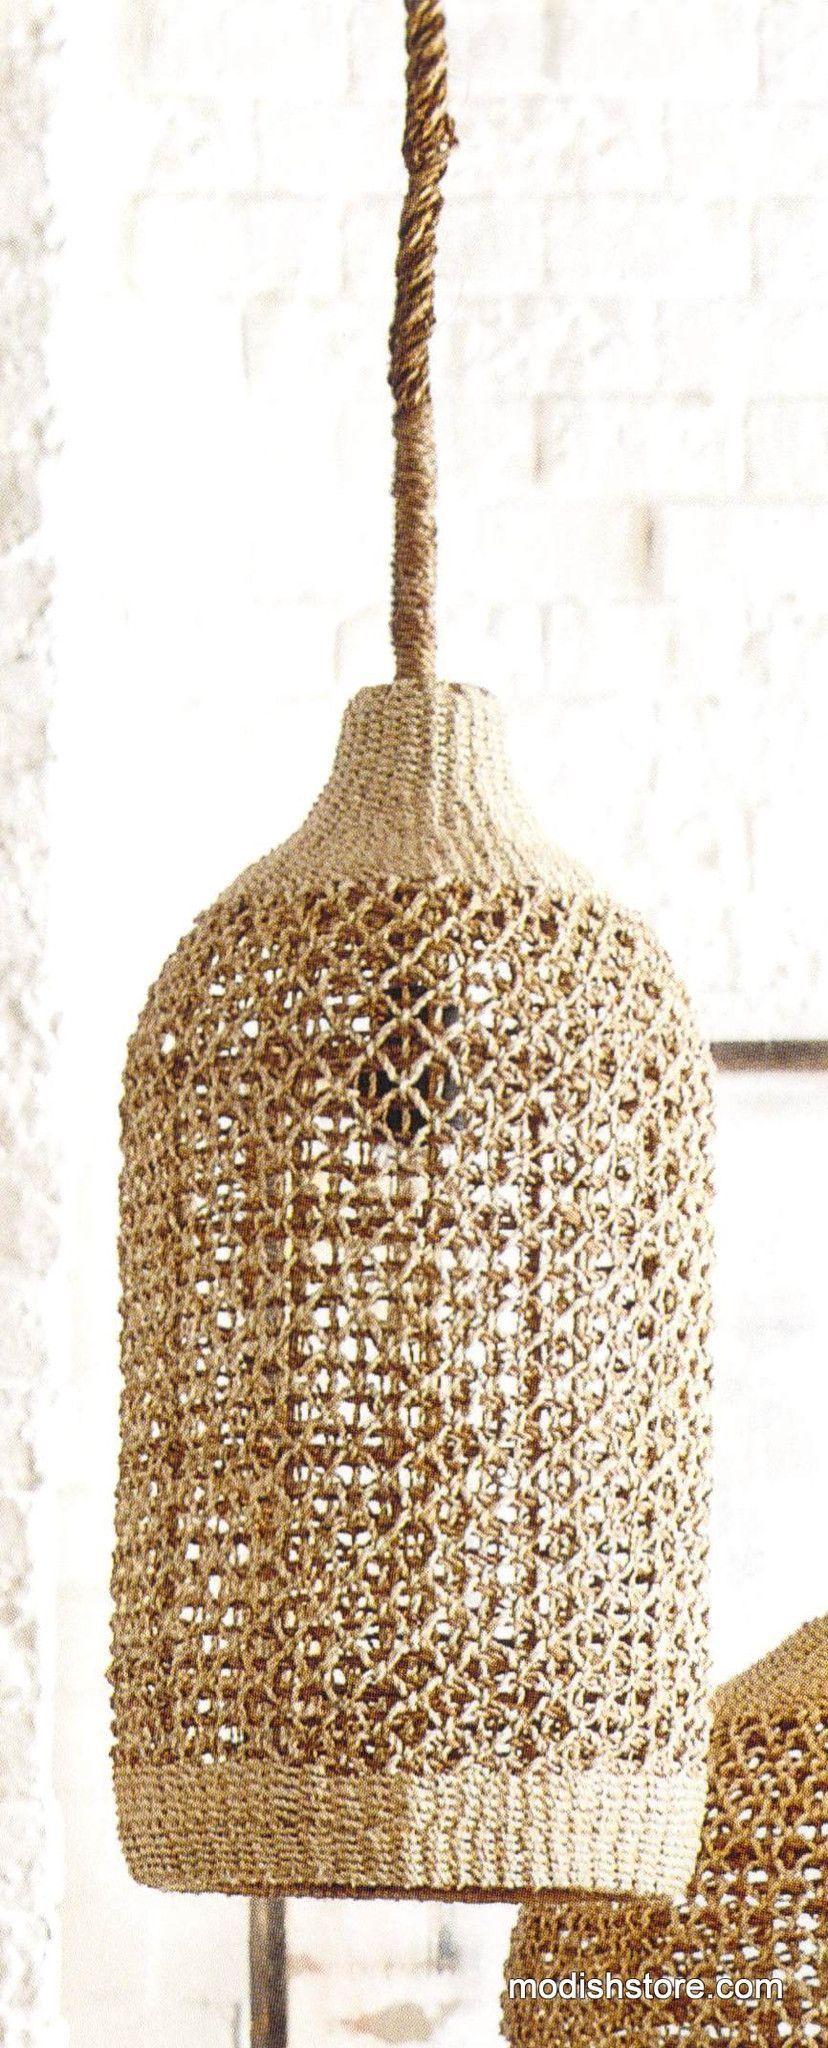 Roost Basket Cloche Lamp Pendant Lamps Modish More Www